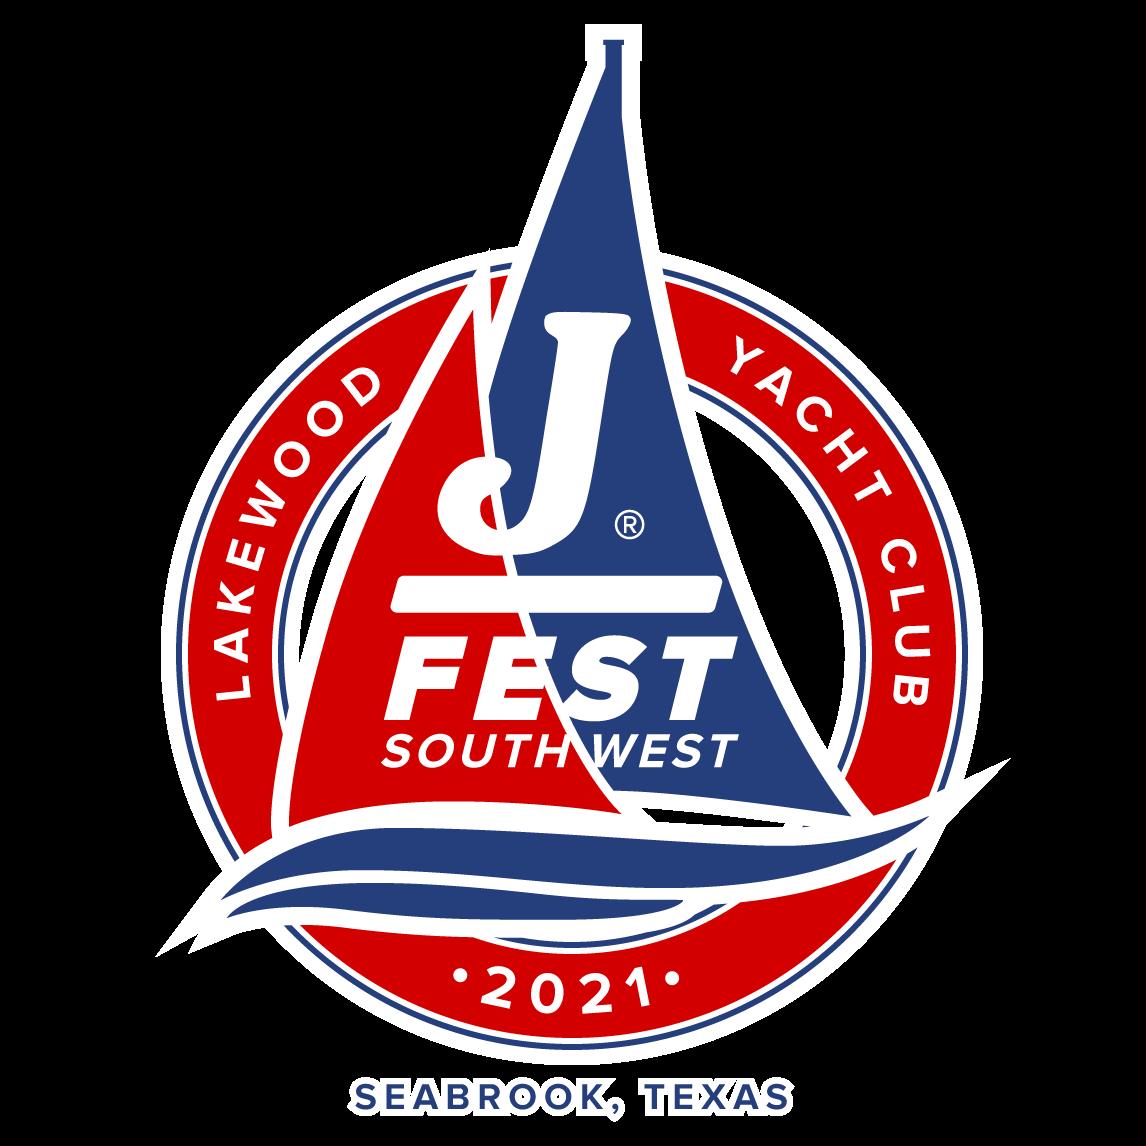 J/Fest Southwest